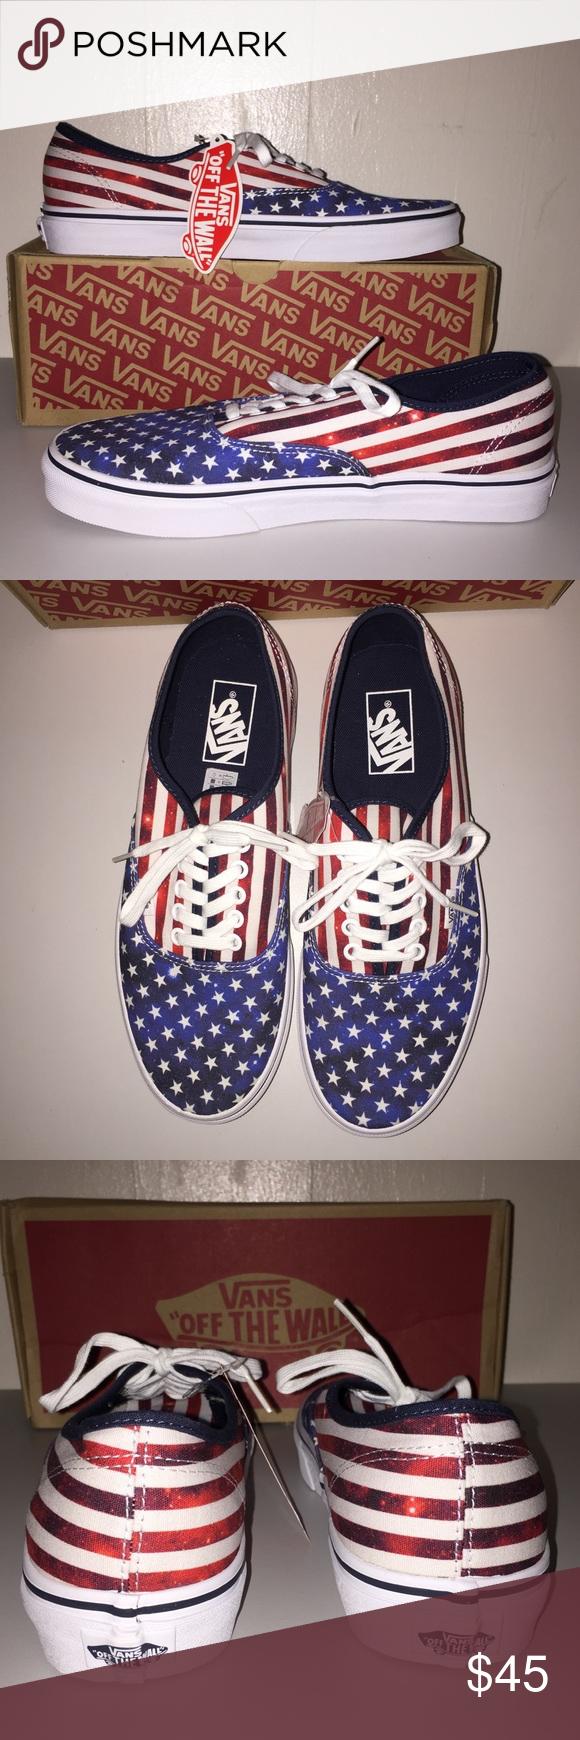 bfff27c479 NWT Vans Men s Authentic Americana Dress Blue Vans Authentic American flag  designed shoes⭐️These shoes